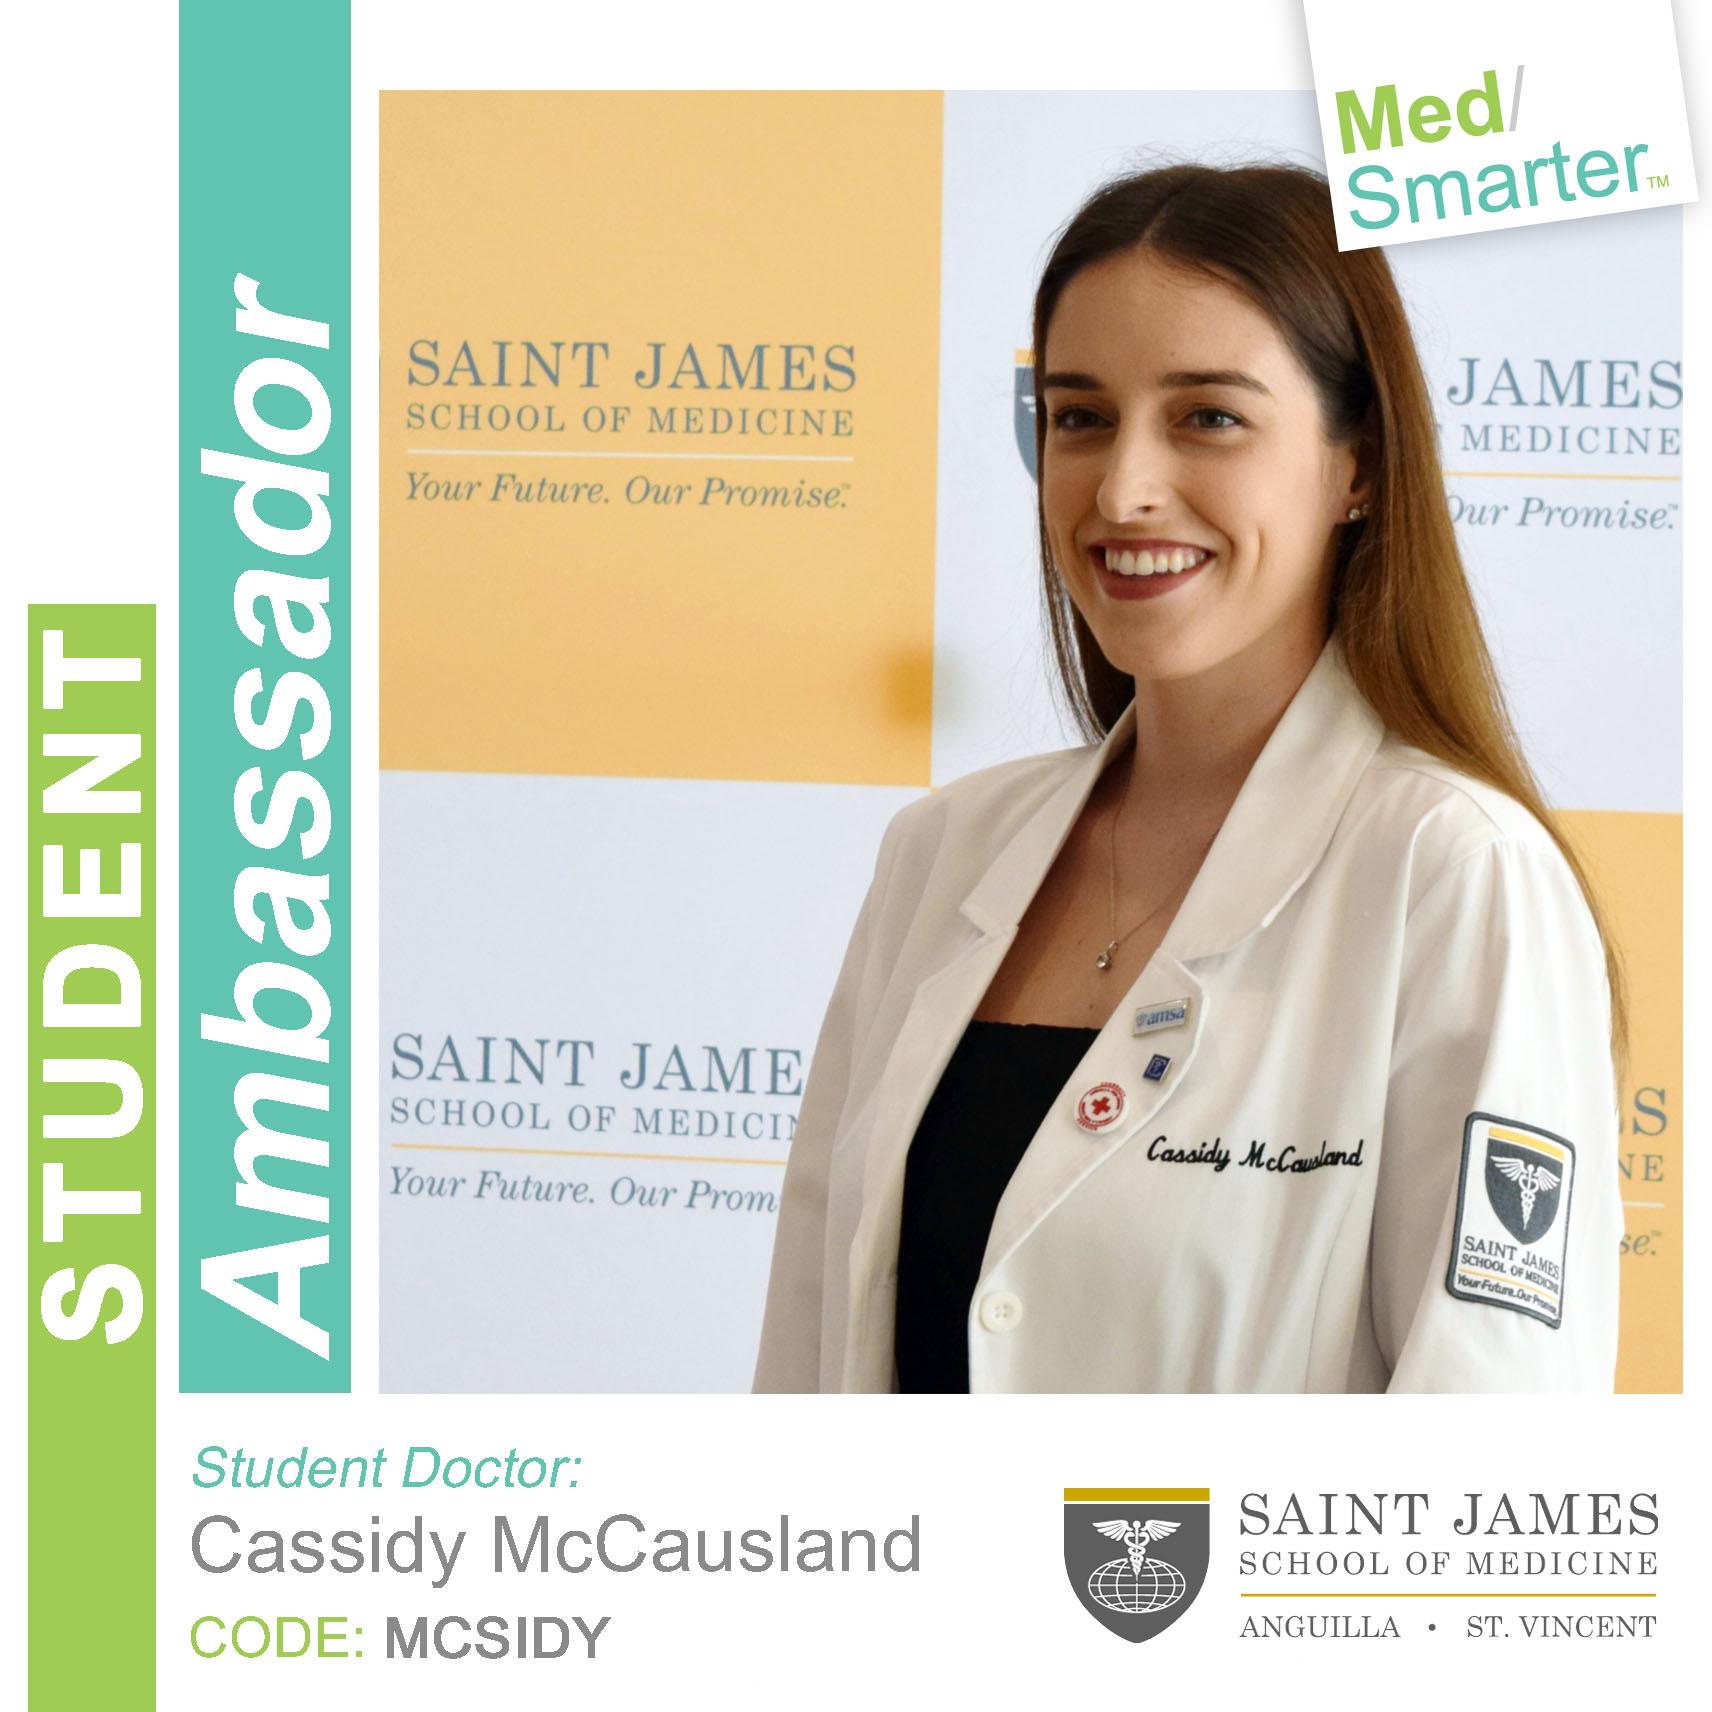 MedSmarter Student Ambassador Cassidy McCausland